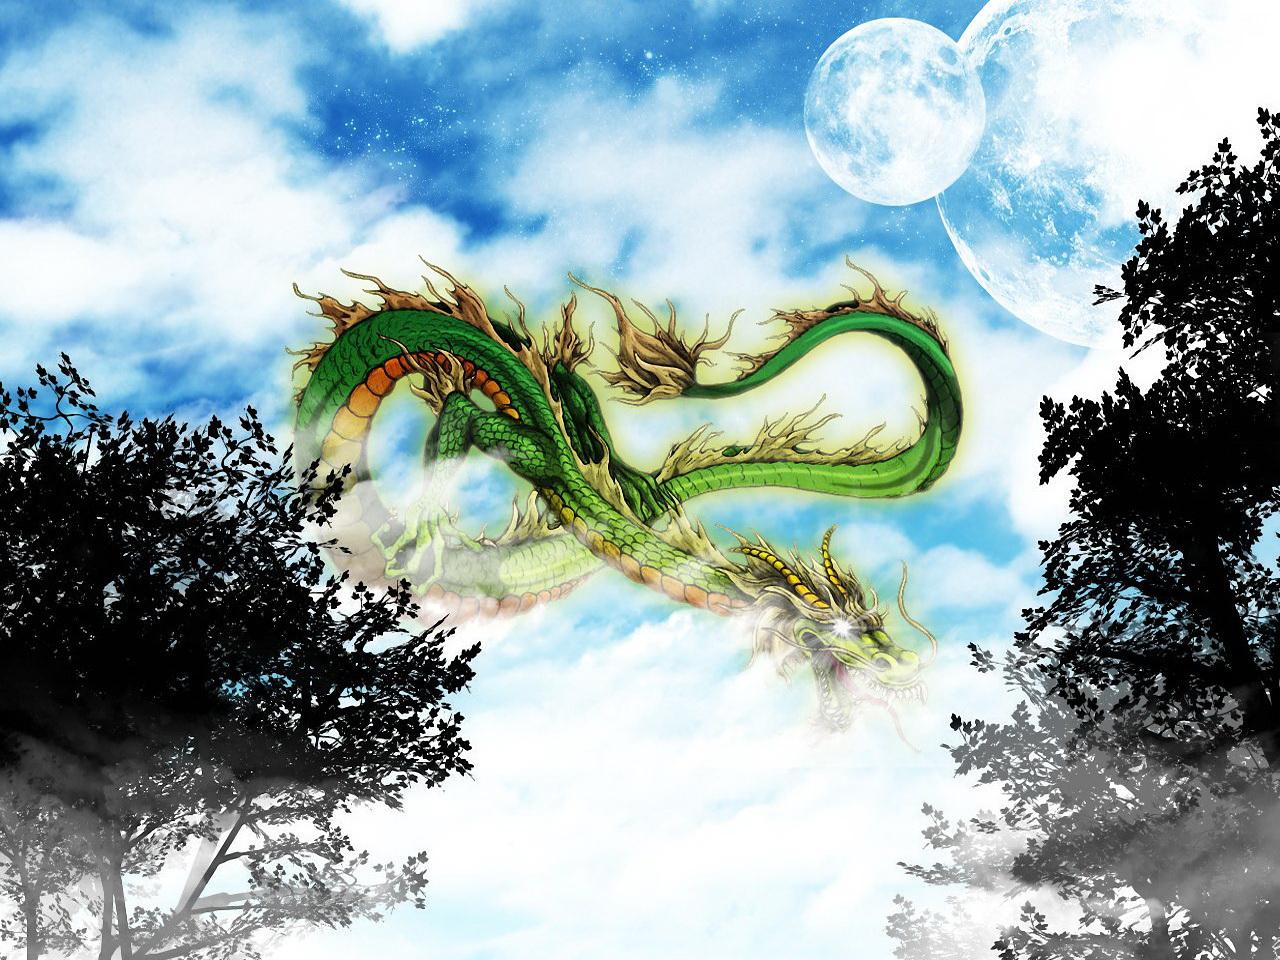 Chinese dragon wallpaper 1280x960 Wallpapers 3d for desktop 3d 1280x960